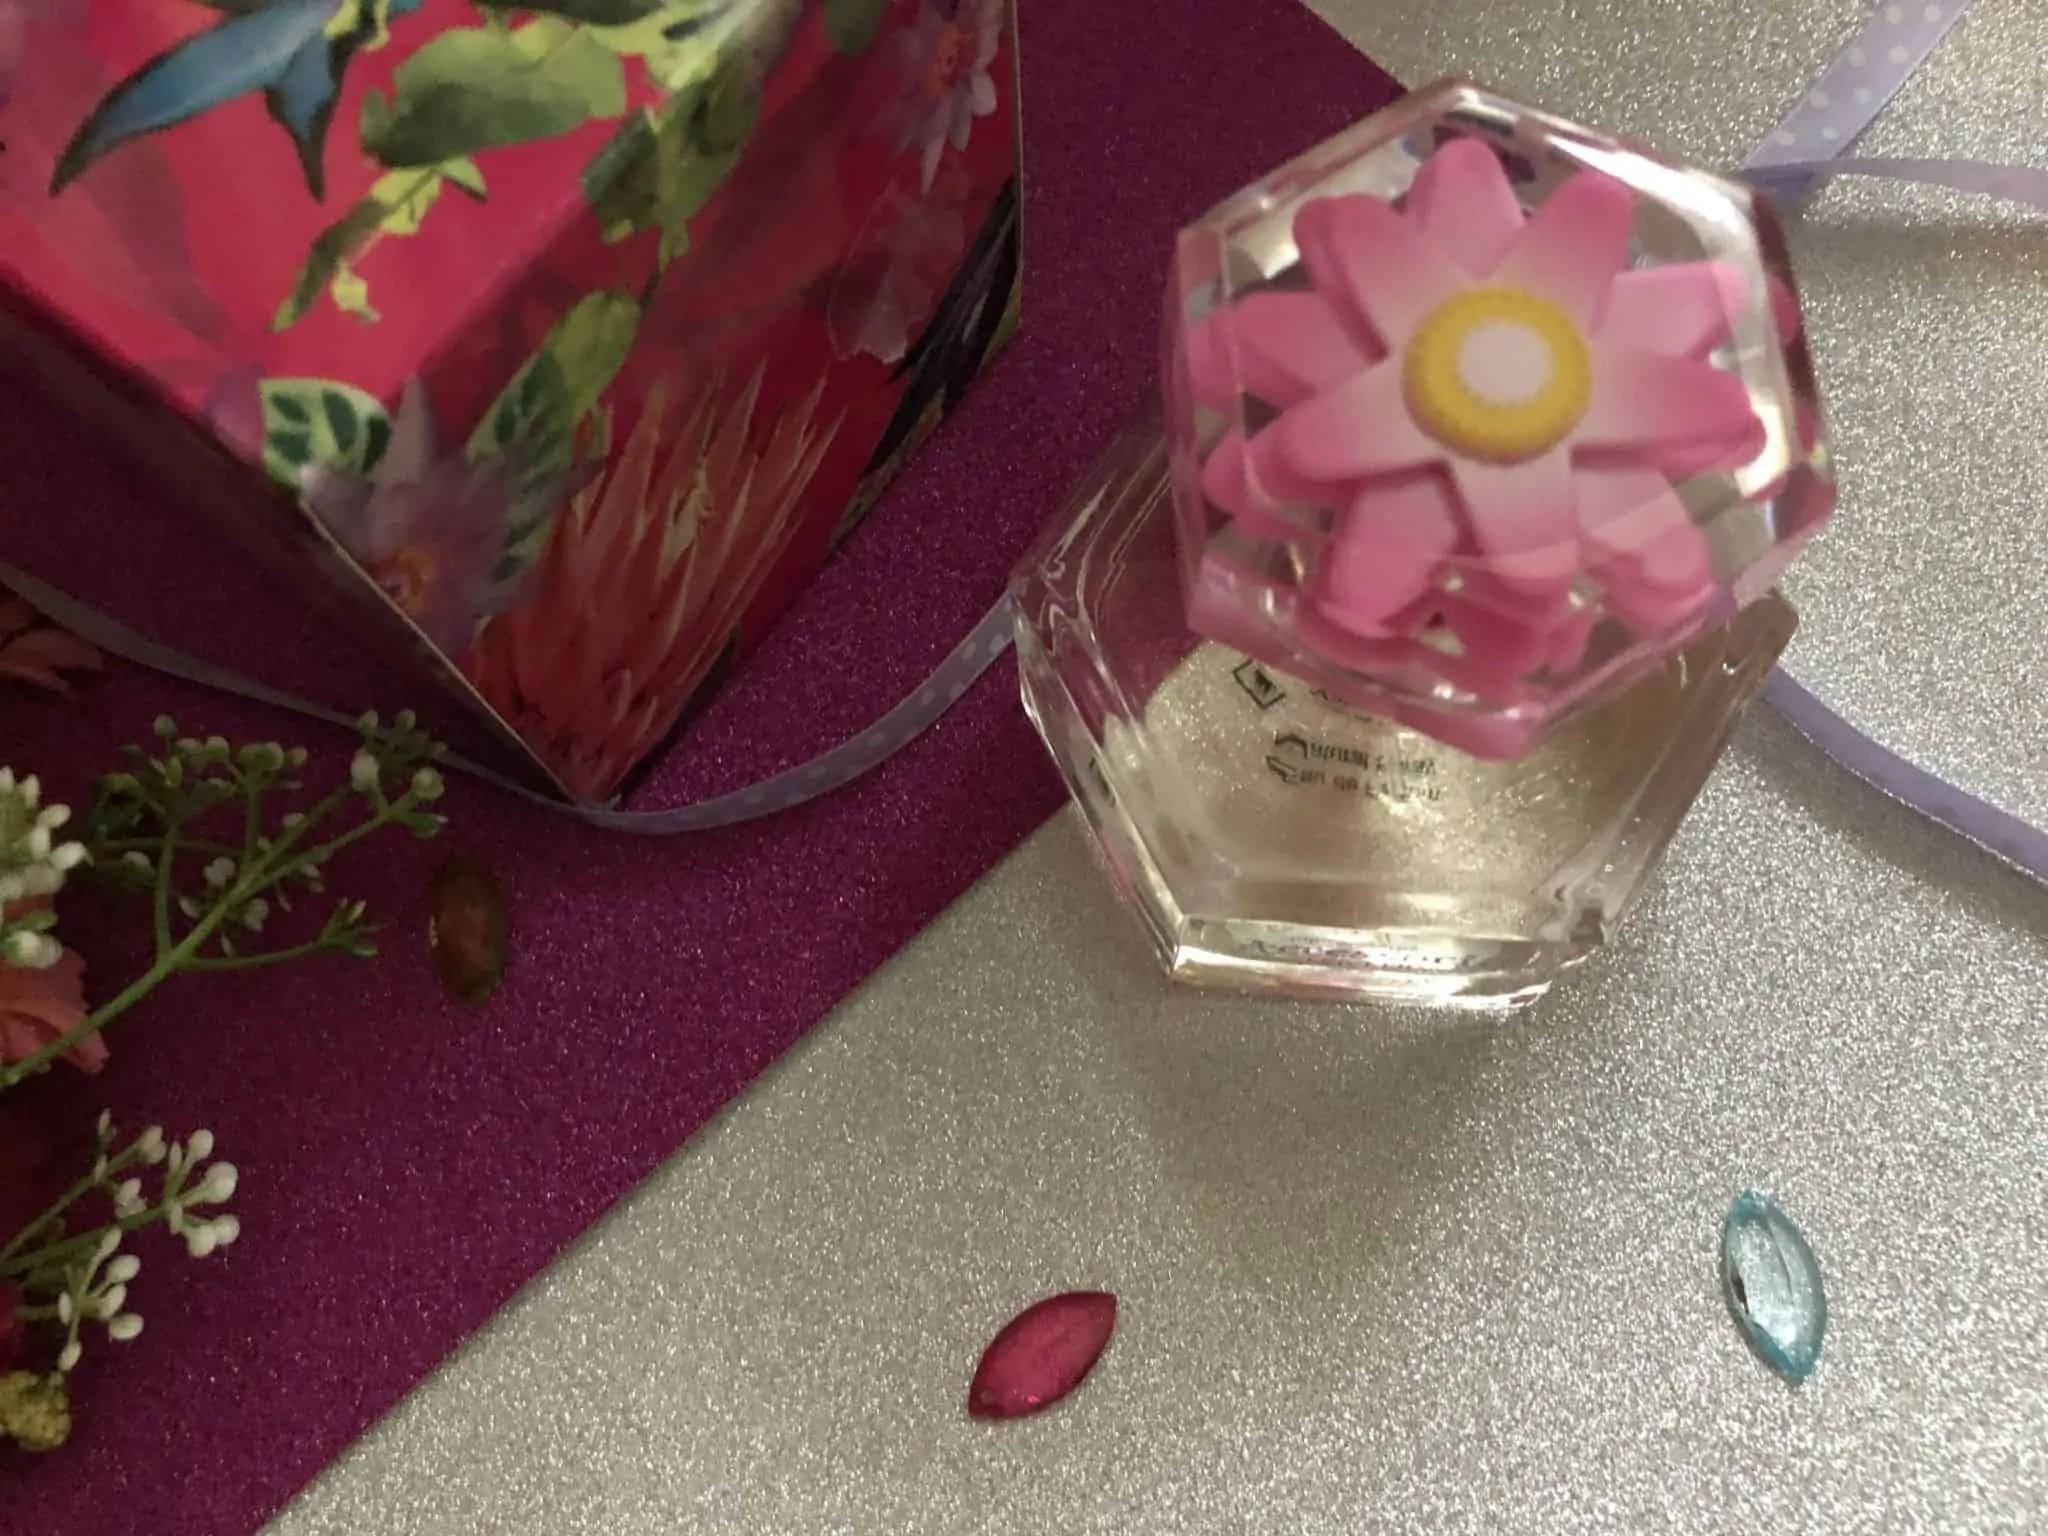 accessorize lovelily perfume decorative lid